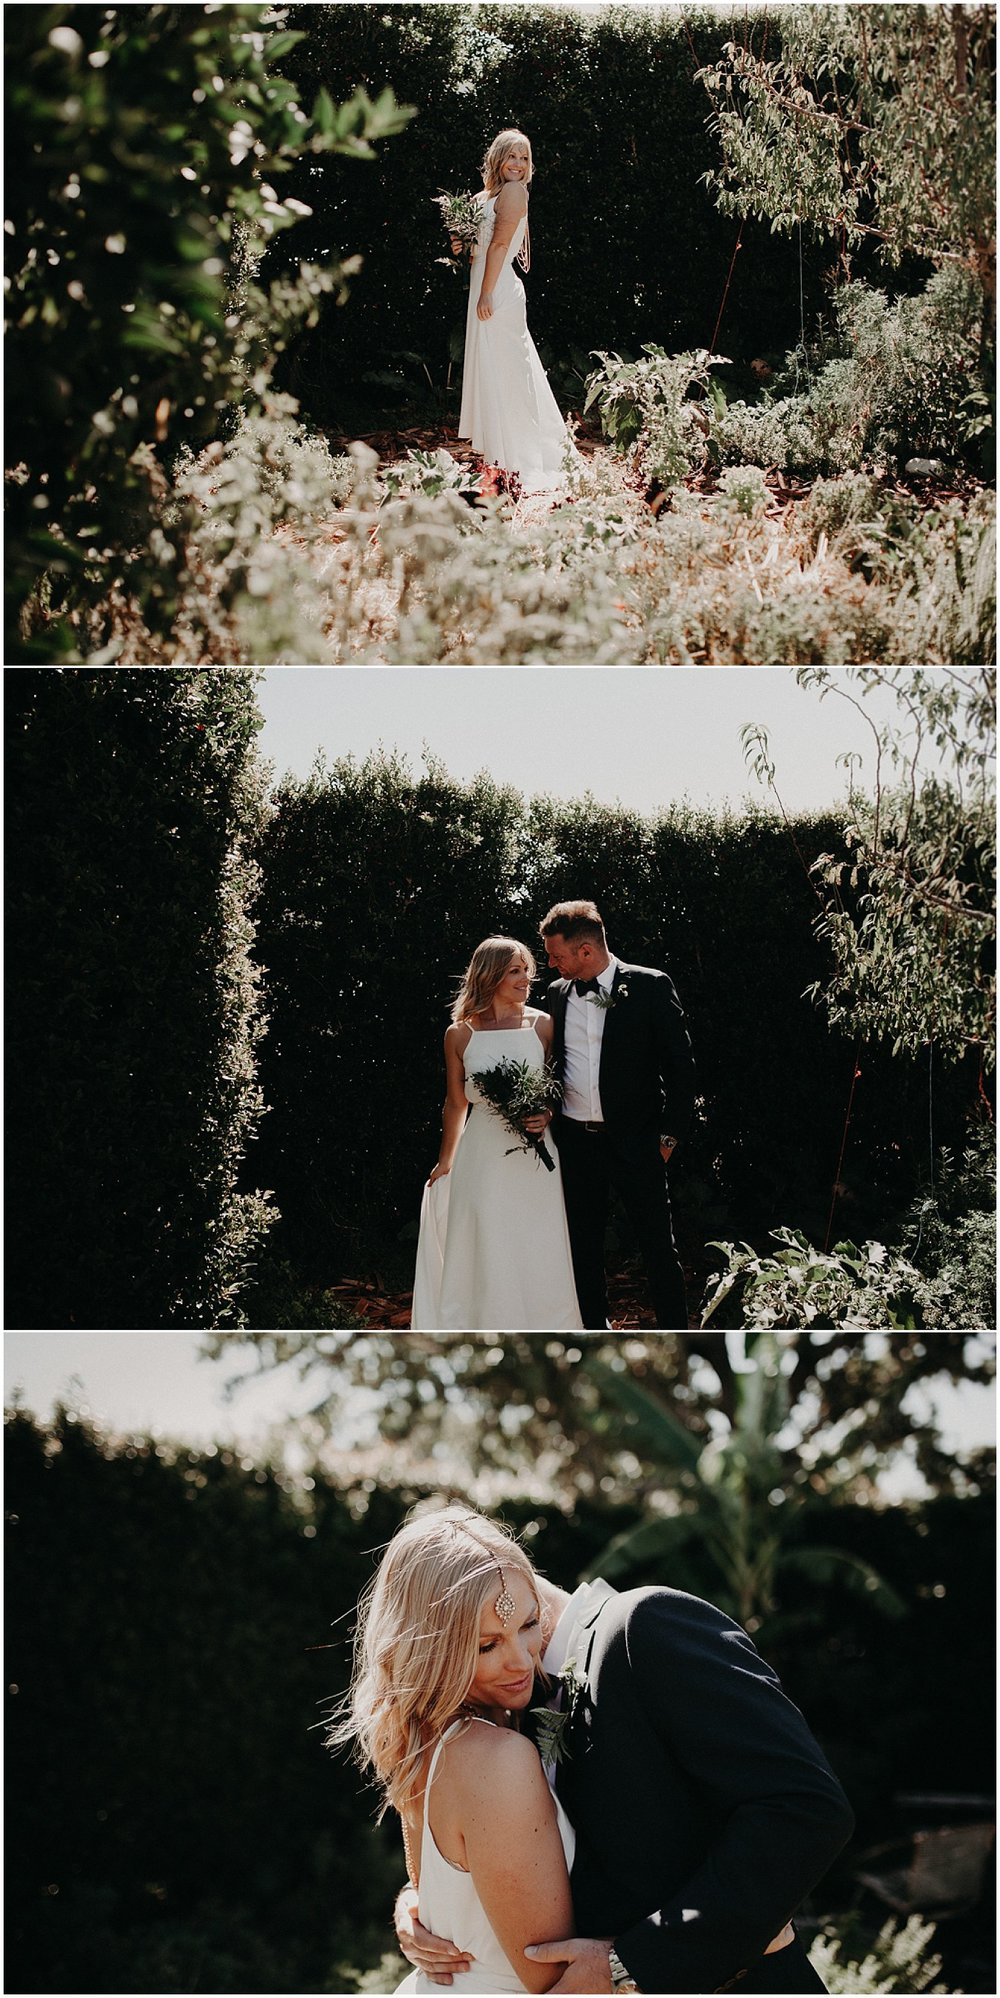 Dan&Holly_fionaclair-147.jpg